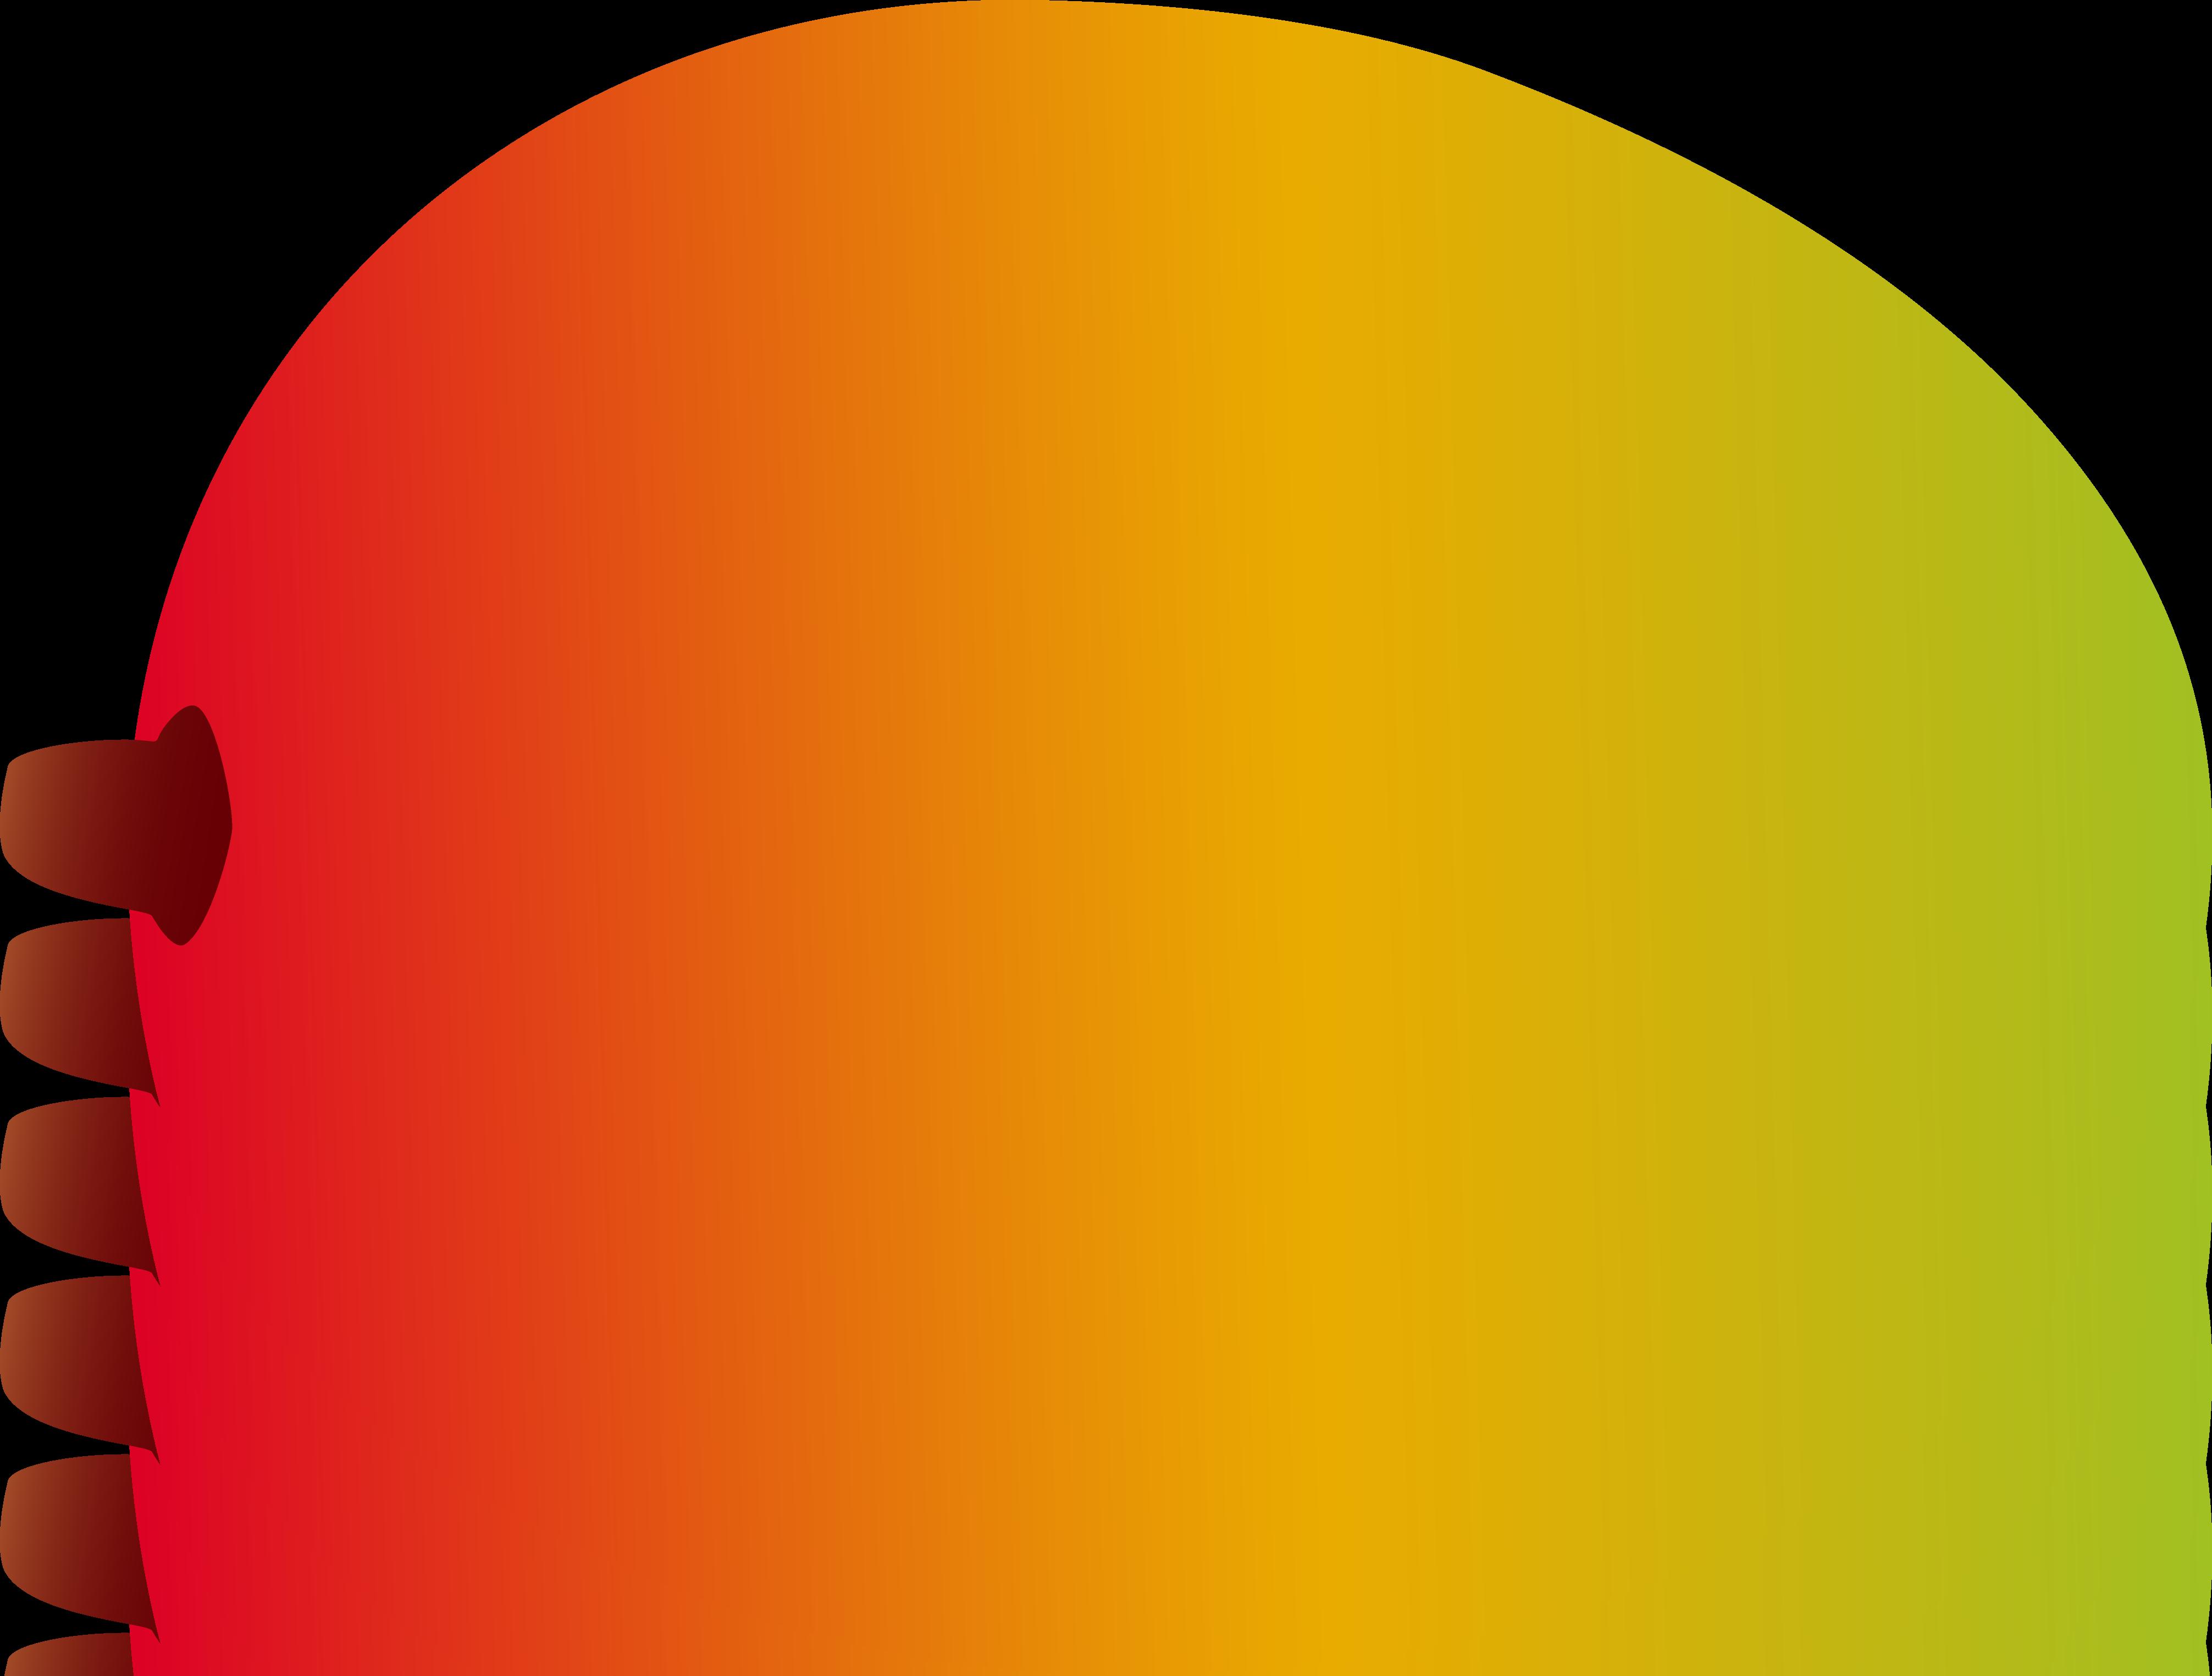 graphic free download Tropical Mango Fruit Vector Art